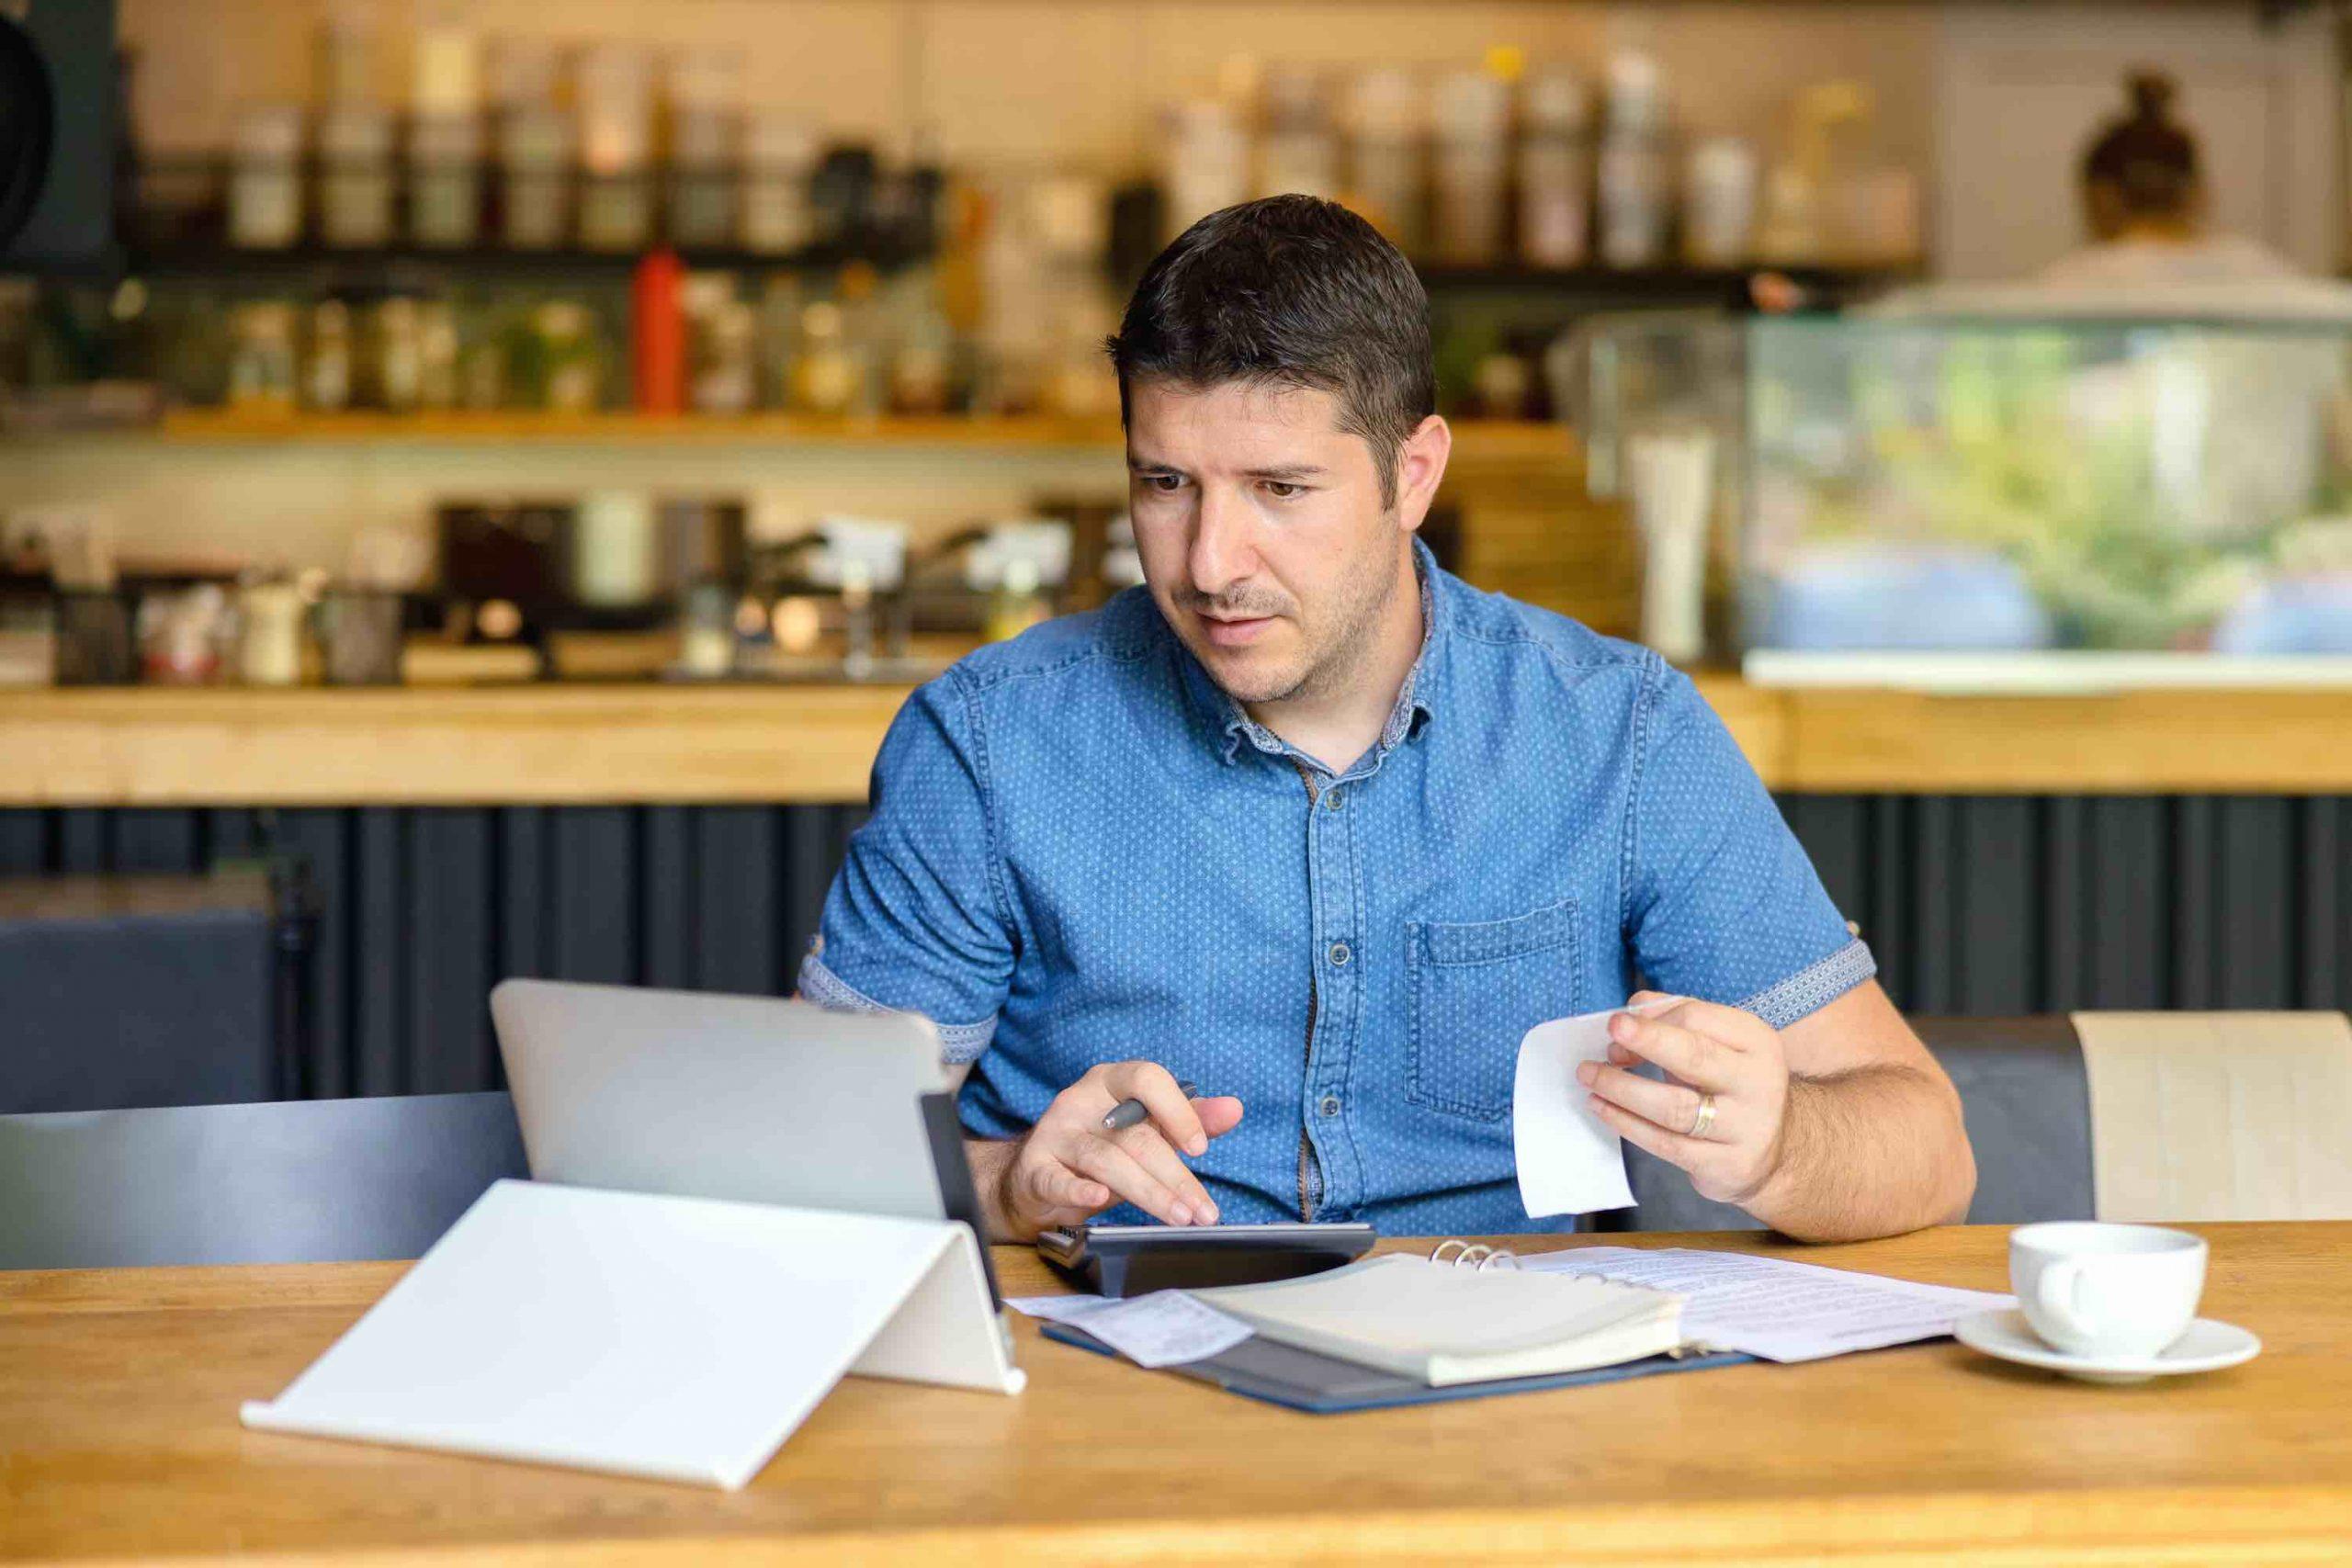 Deducting startup expenses